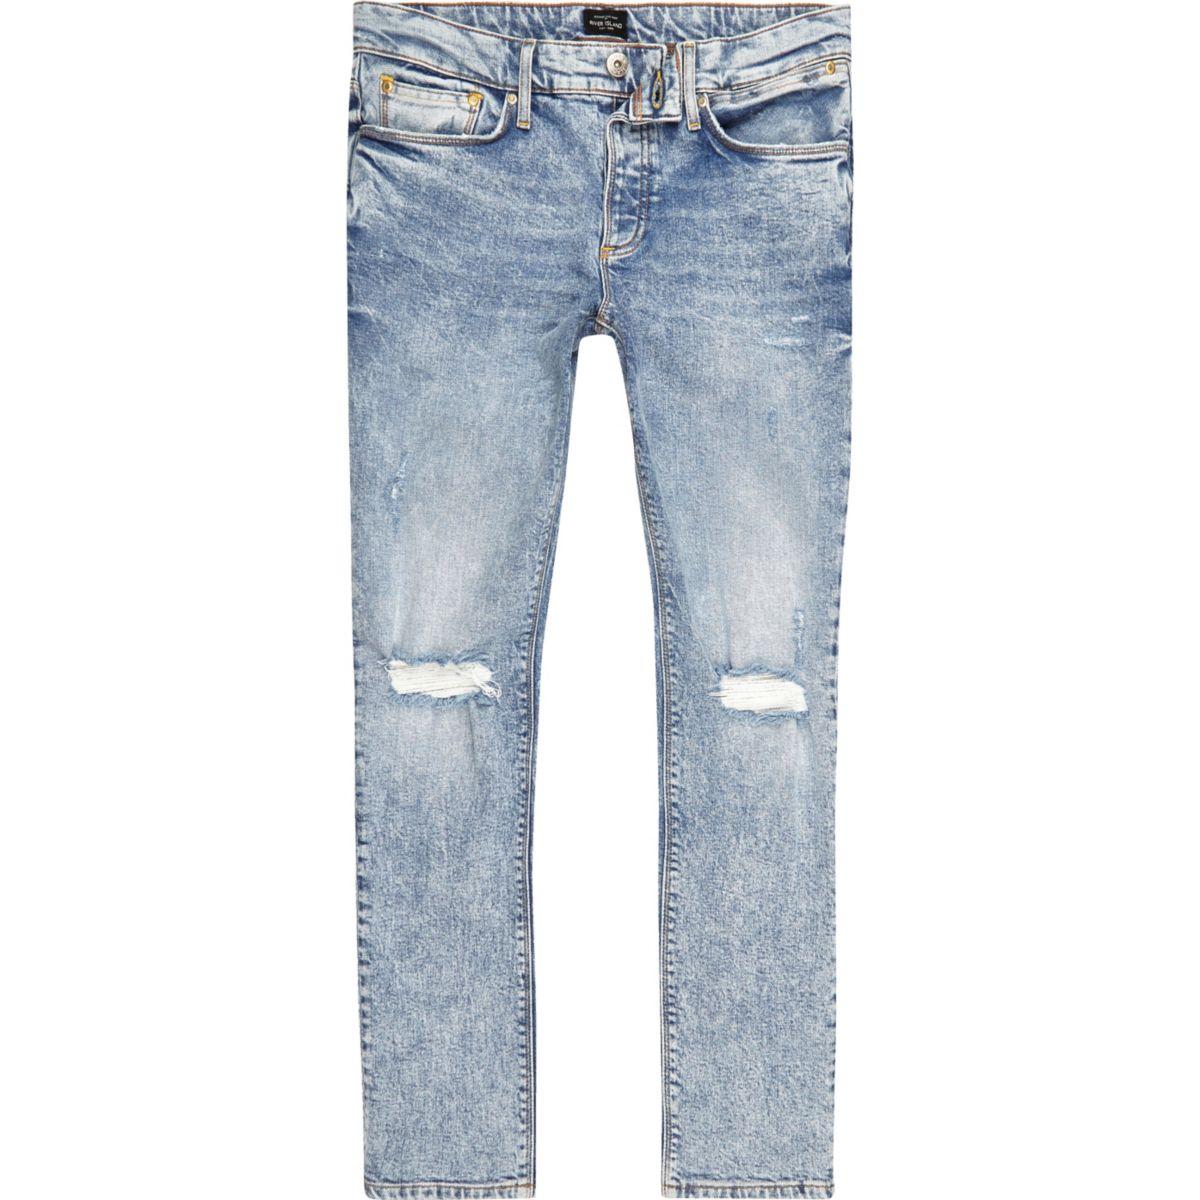 Light blue ripped knee Sid skinny jeans